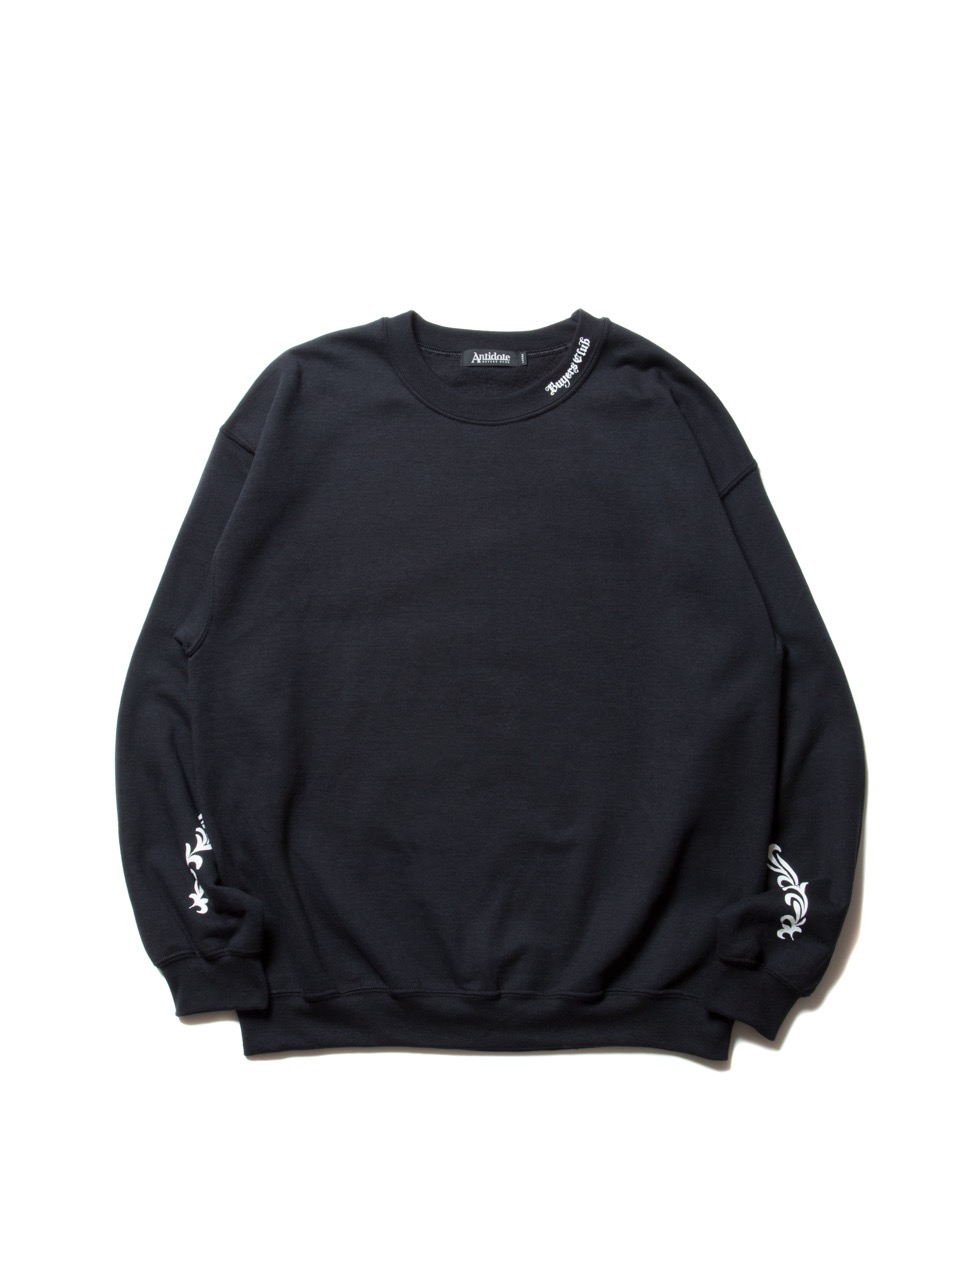 ANTIDOTE BUYERS CLUB Crewneck L/S Sweatshirt ORNAMENT